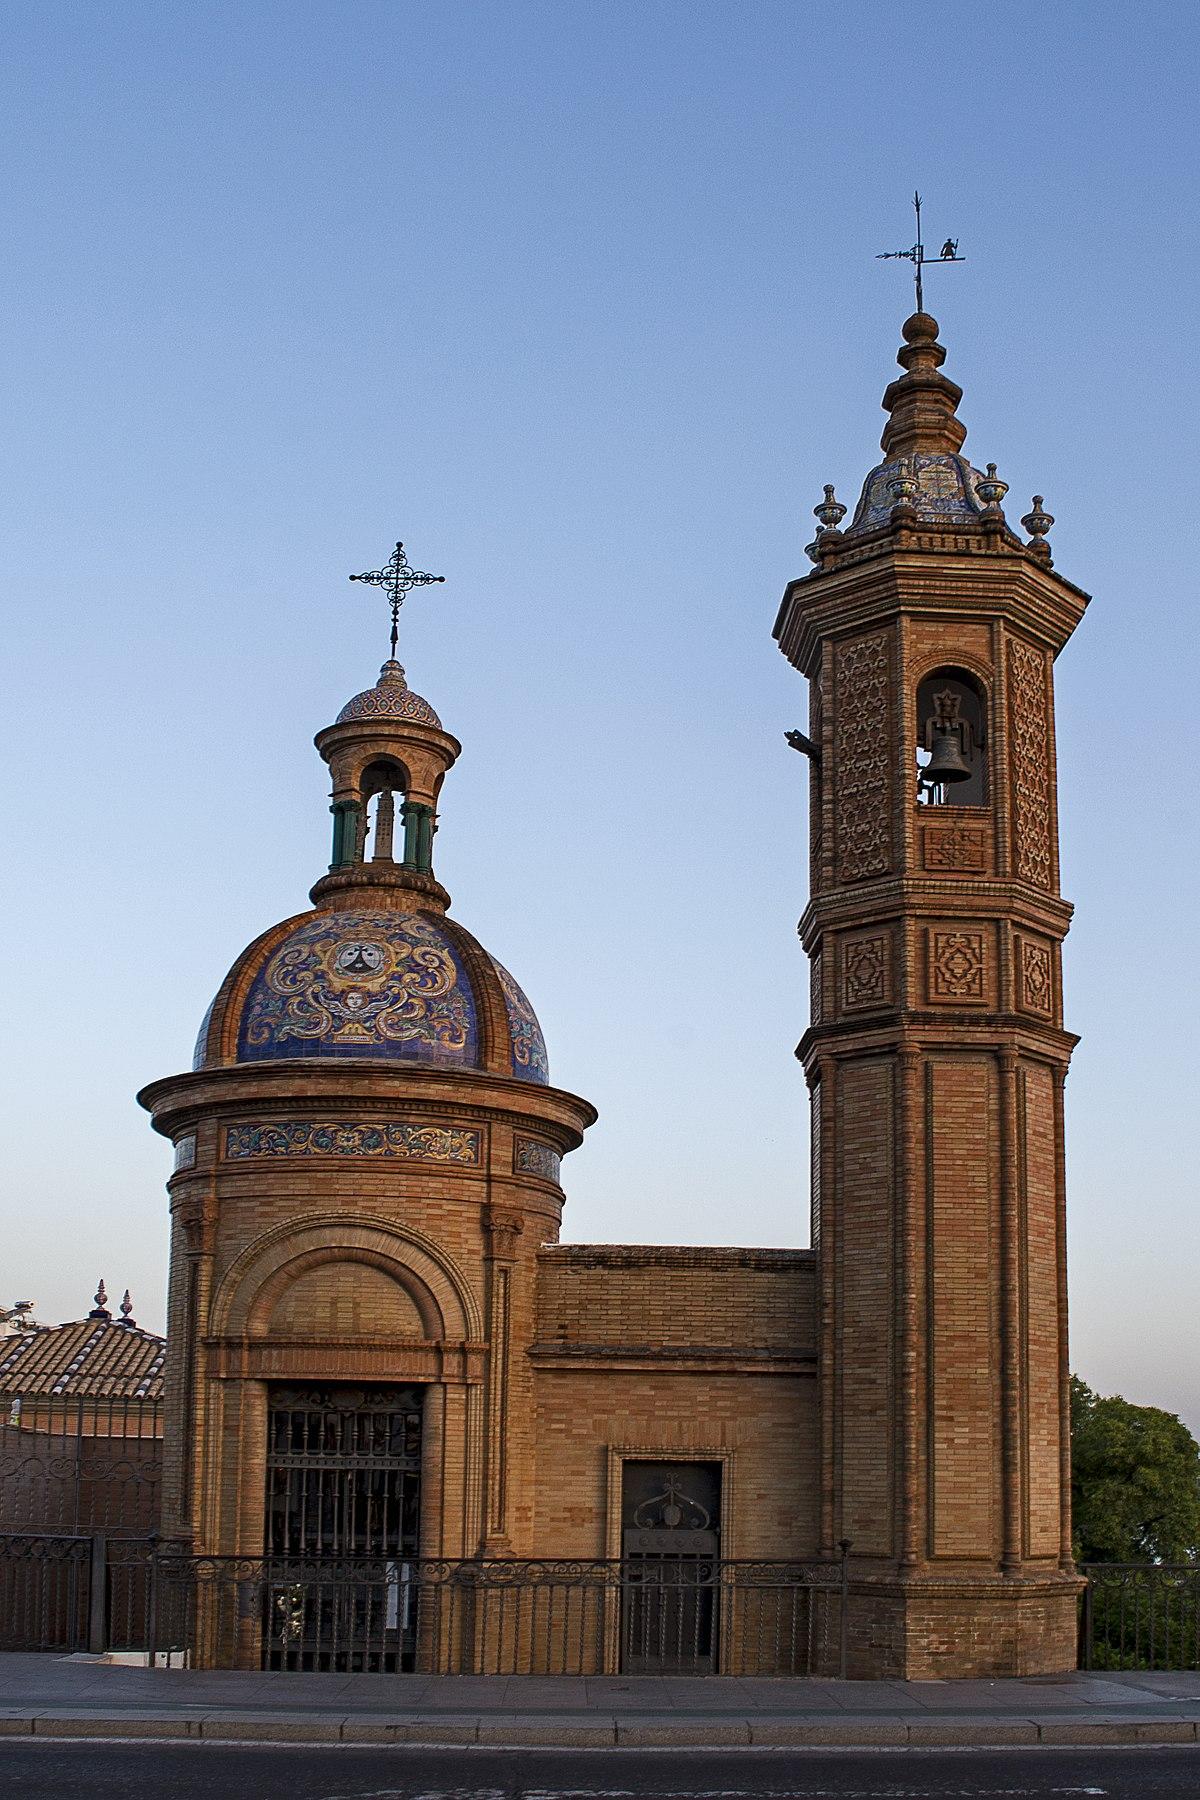 Ancho De Calle >> Capilla del Carmen (Sevilla) - Wikipedia, la enciclopedia libre